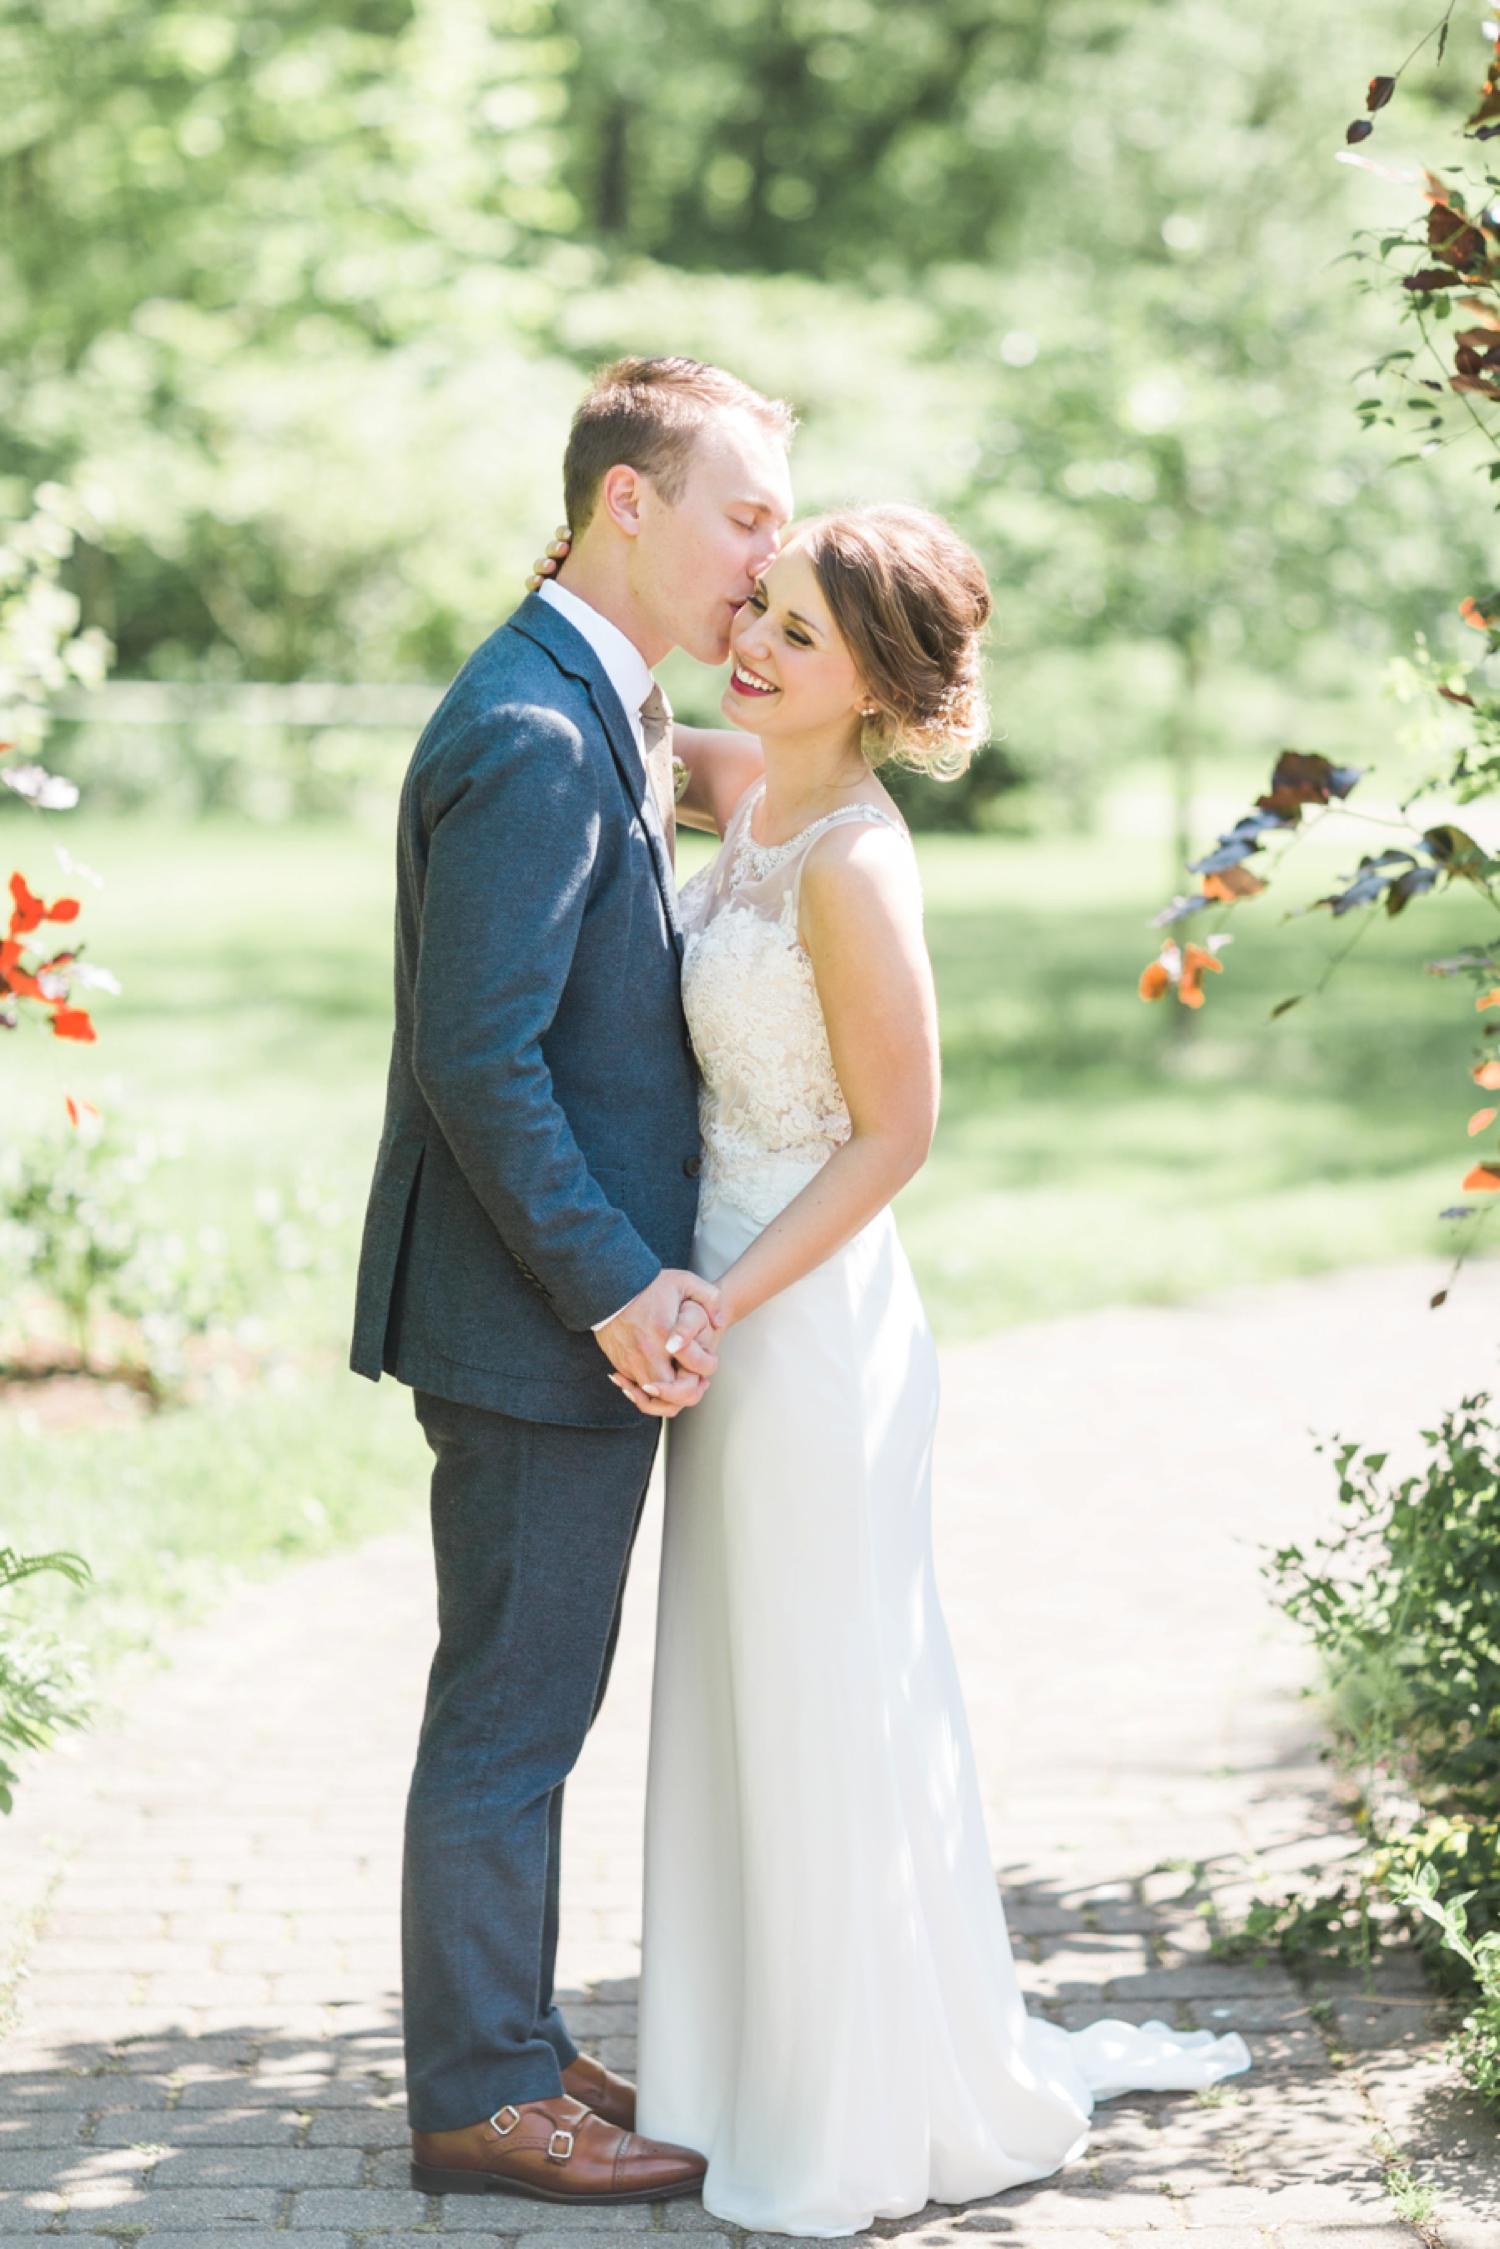 wegerzyn-gardens-wedding-dayton-ohio-chloe-luka-photography_0051.jpg